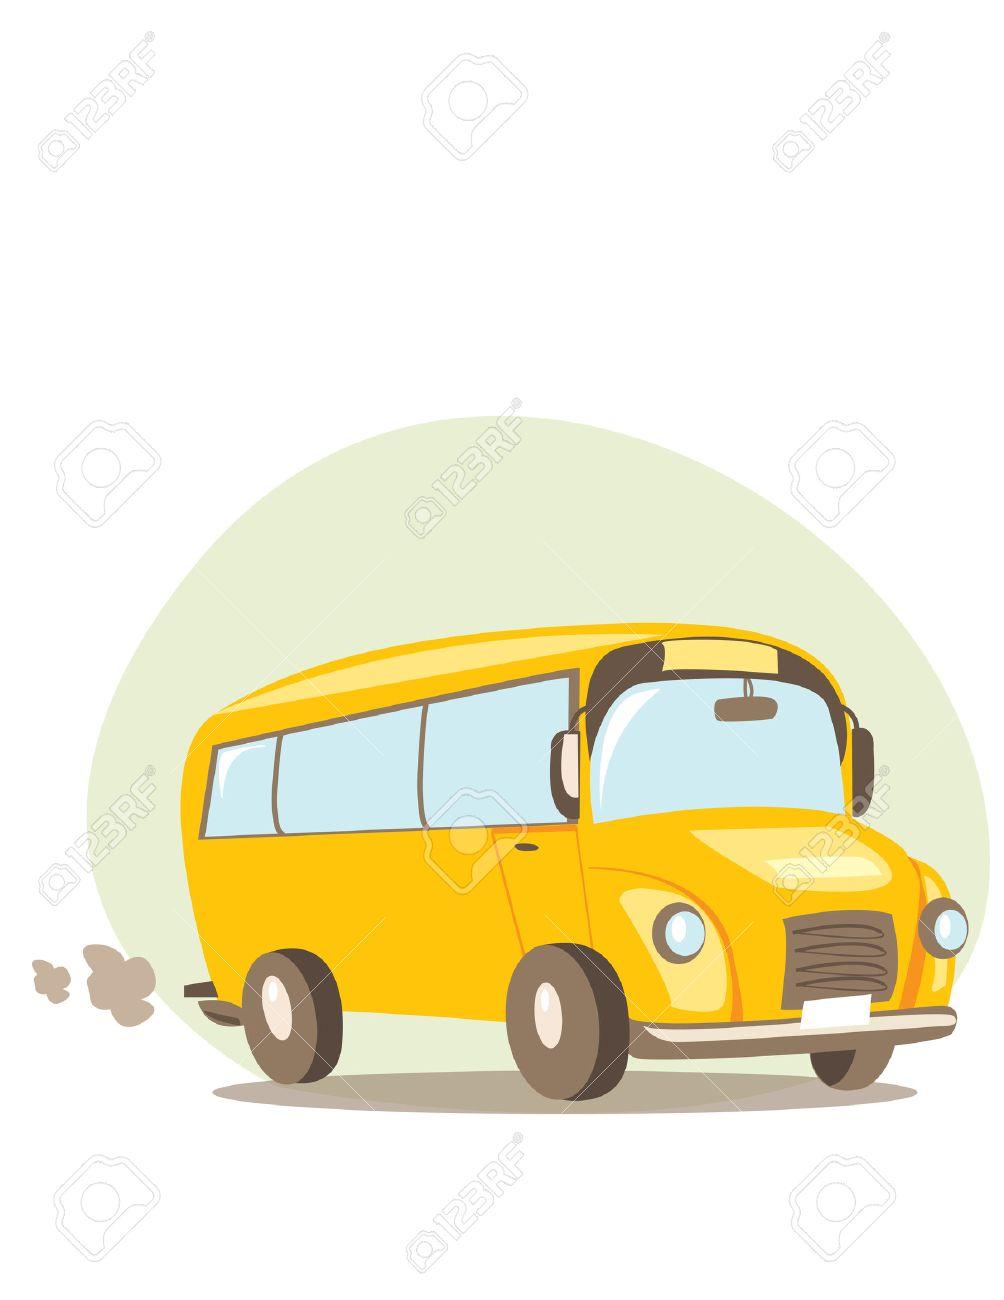 School bus  illustration Stock Vector - 5500027